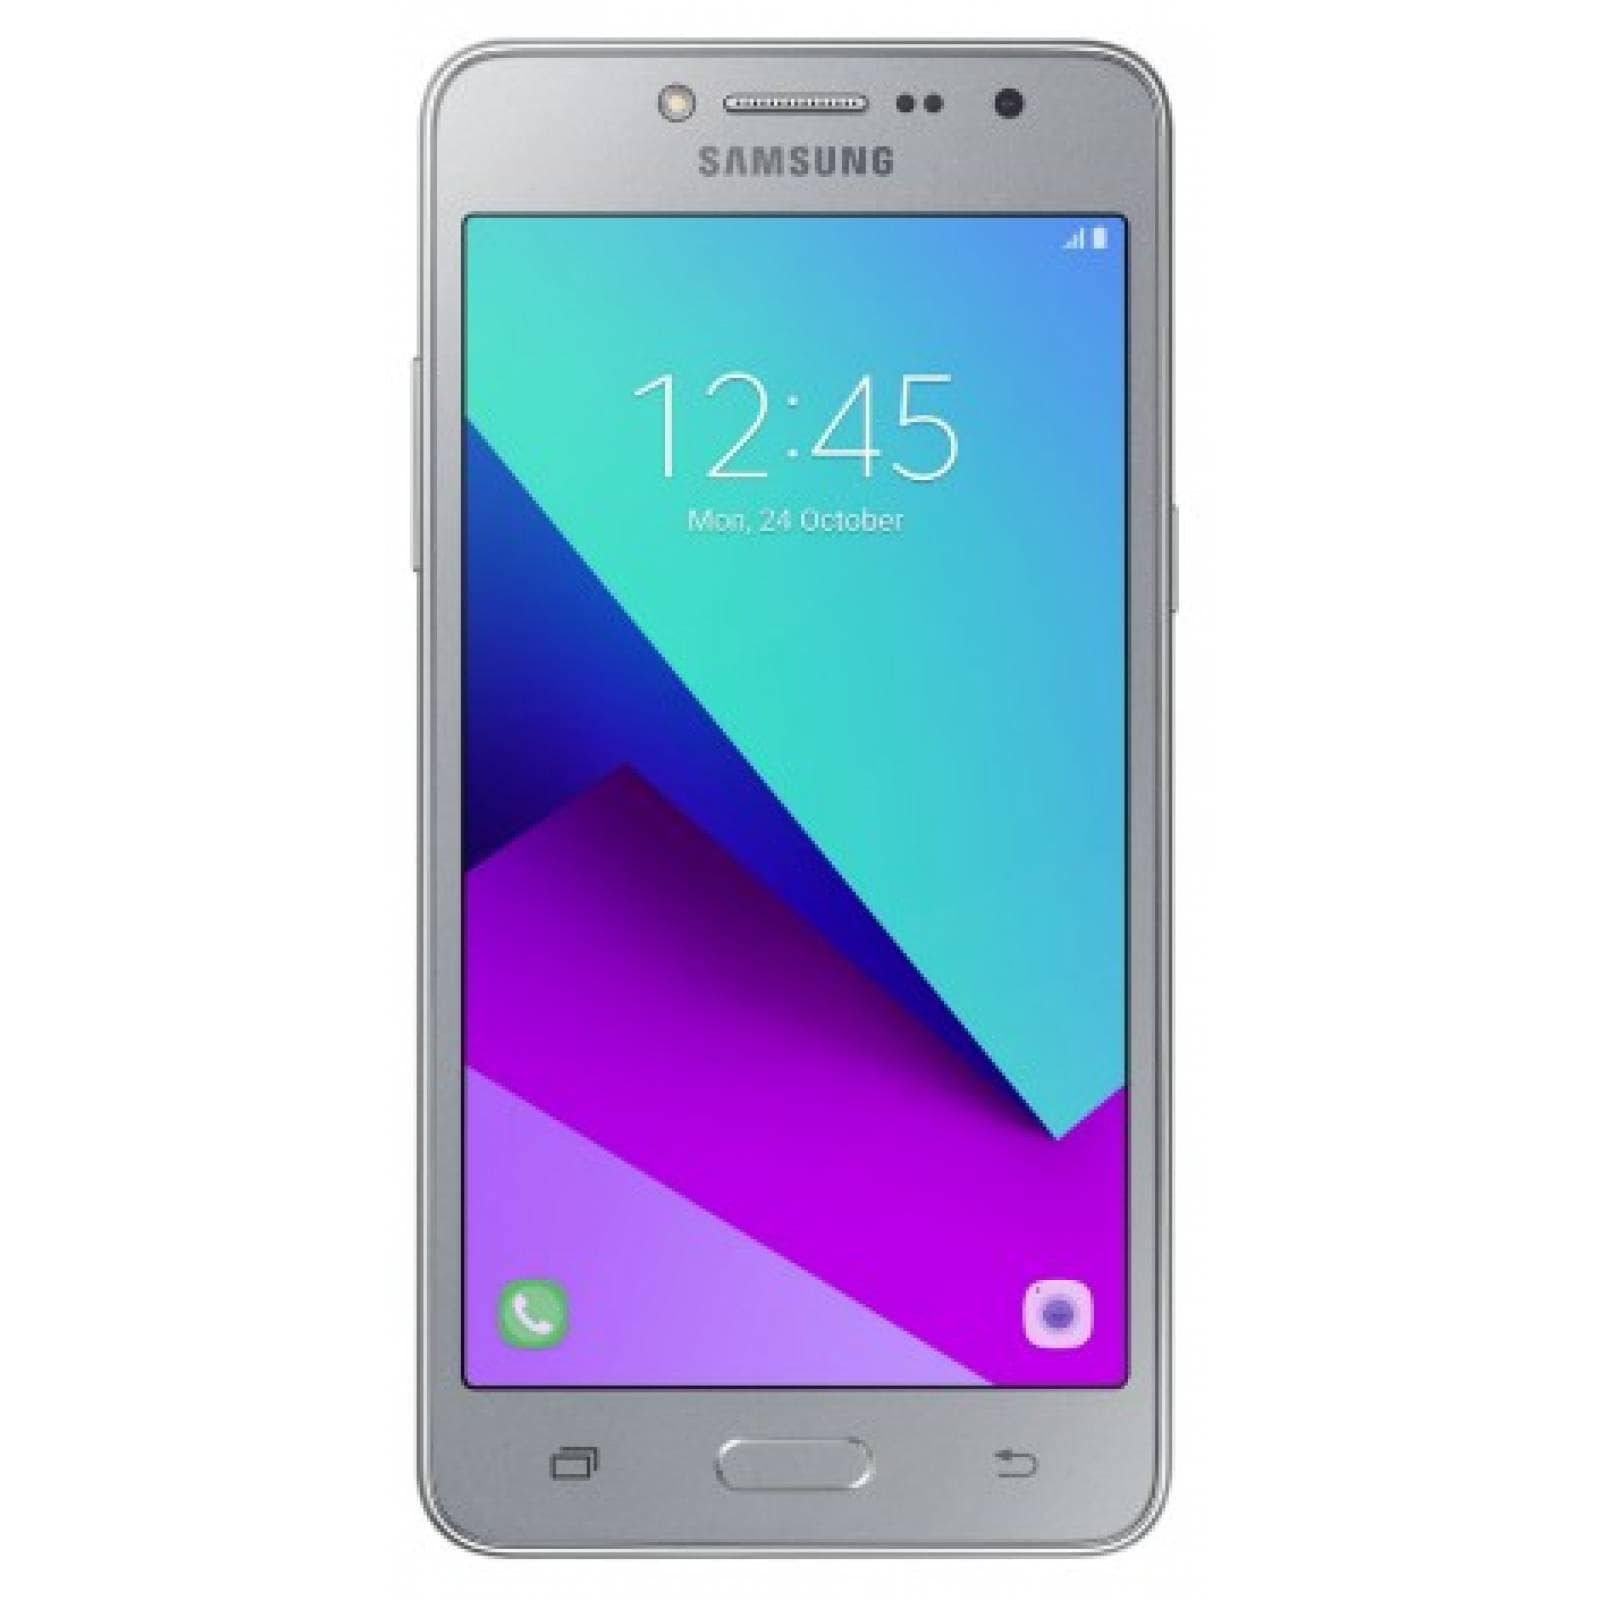 Celular LTE 16GB GALAXY GRAND PRIME + Color Plata (Telcel)